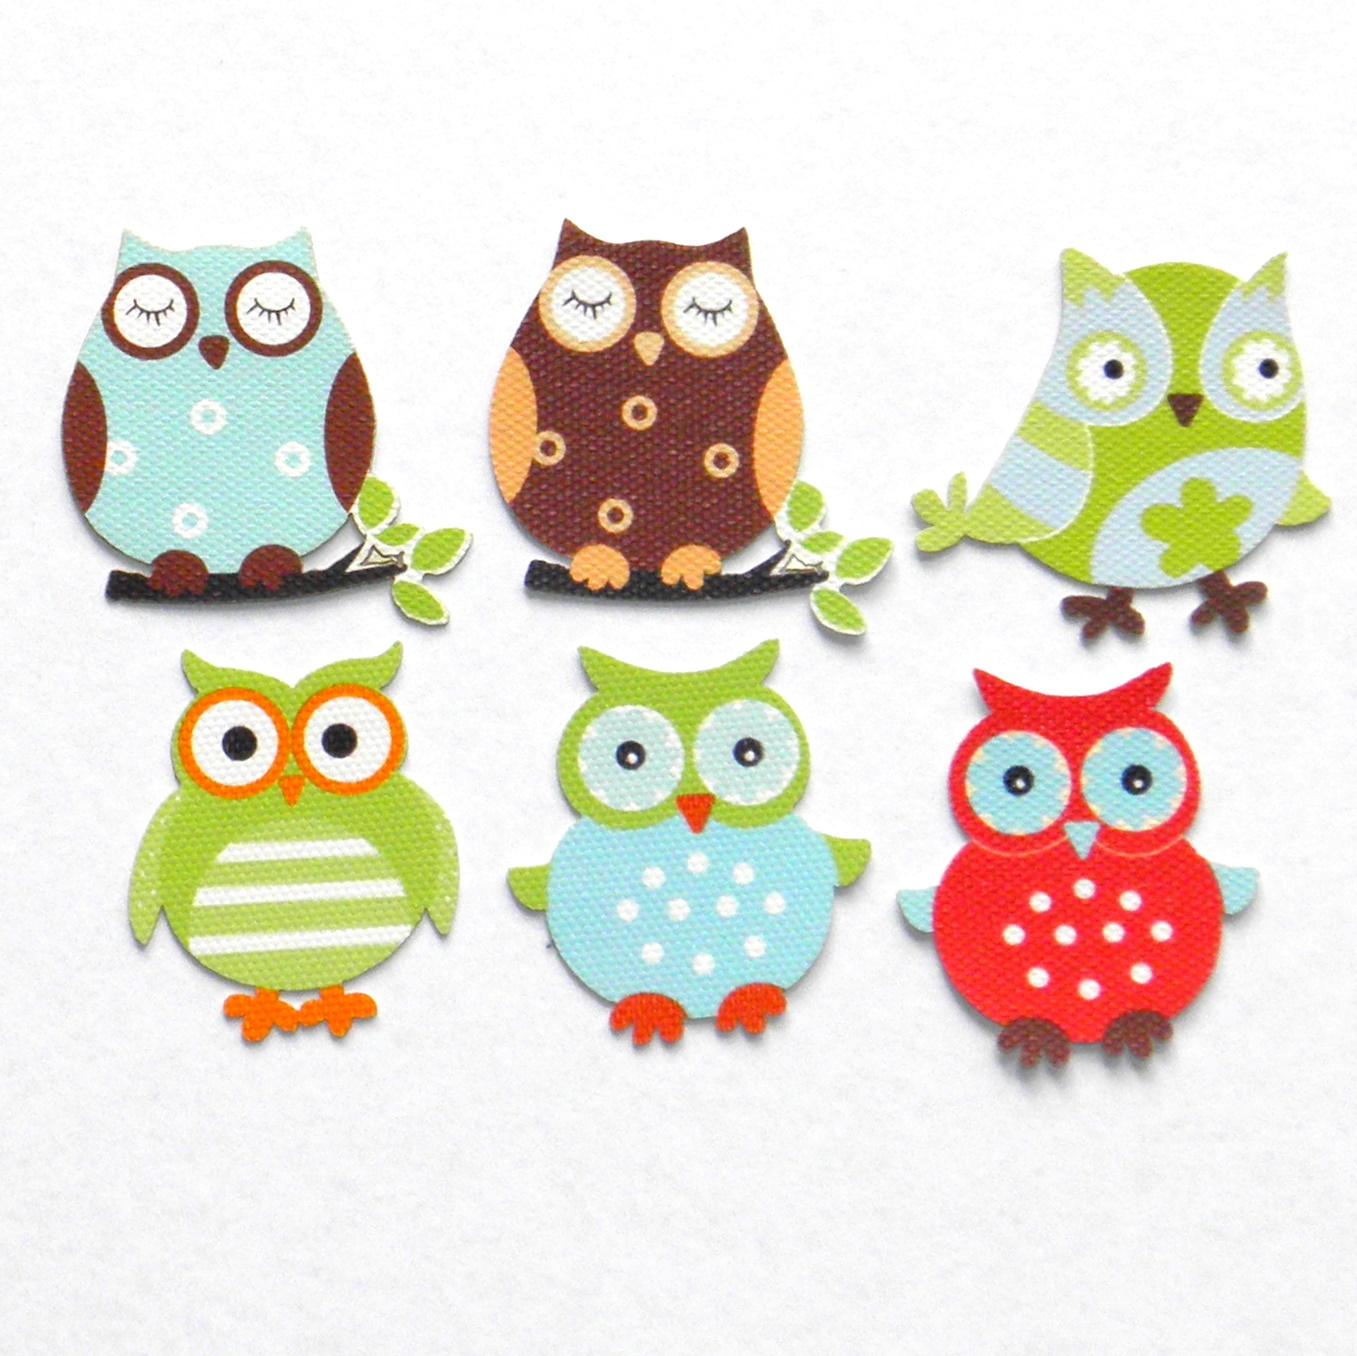 Lorna blue studio cute canvas owls